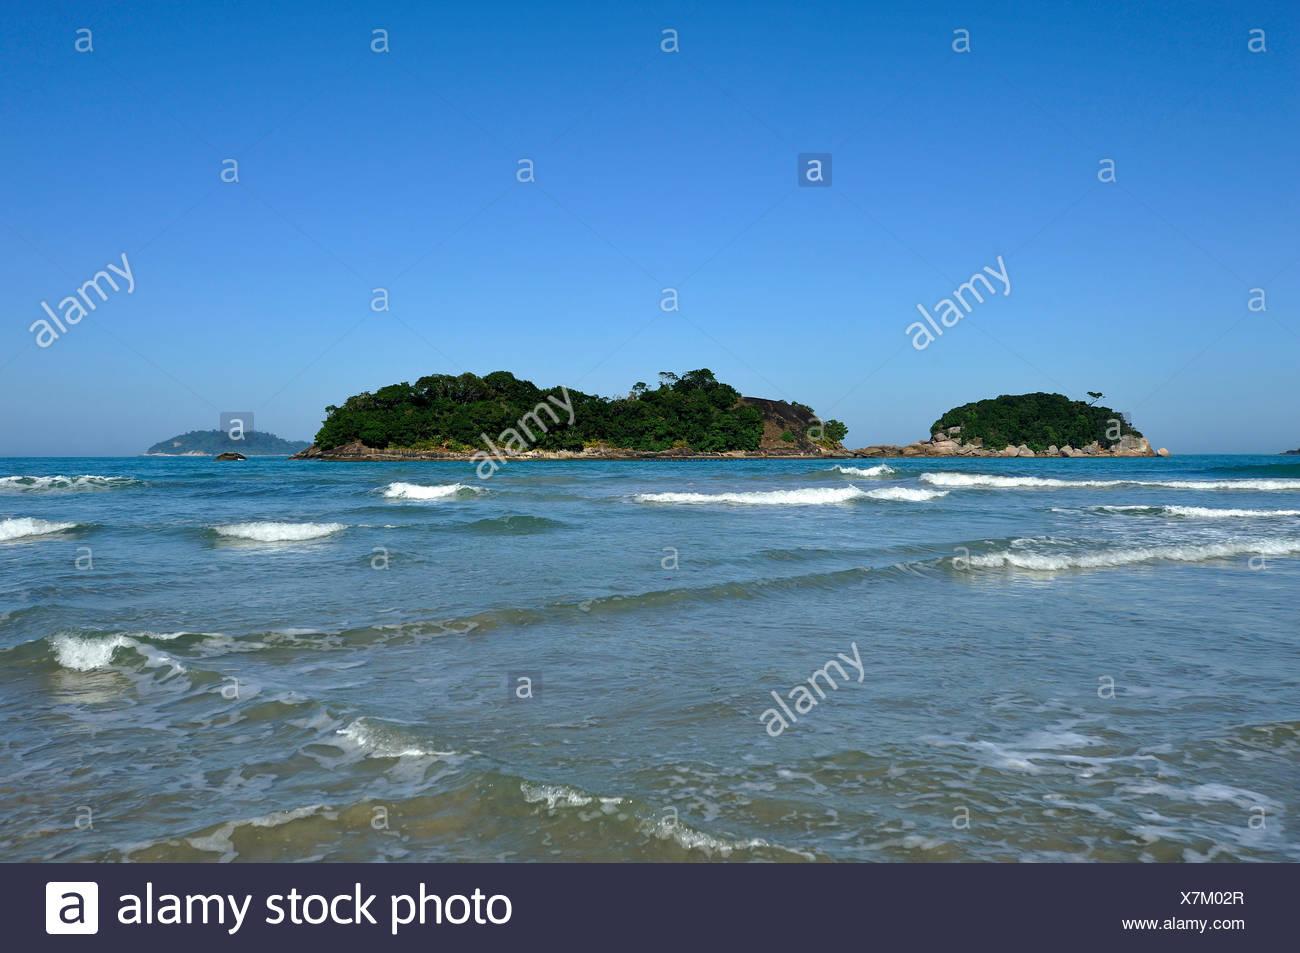 Outlying Islands, Dois Rios beach, Ilha Grande, stato di Rio de Janeiro, Brasile, Sud America Immagini Stock